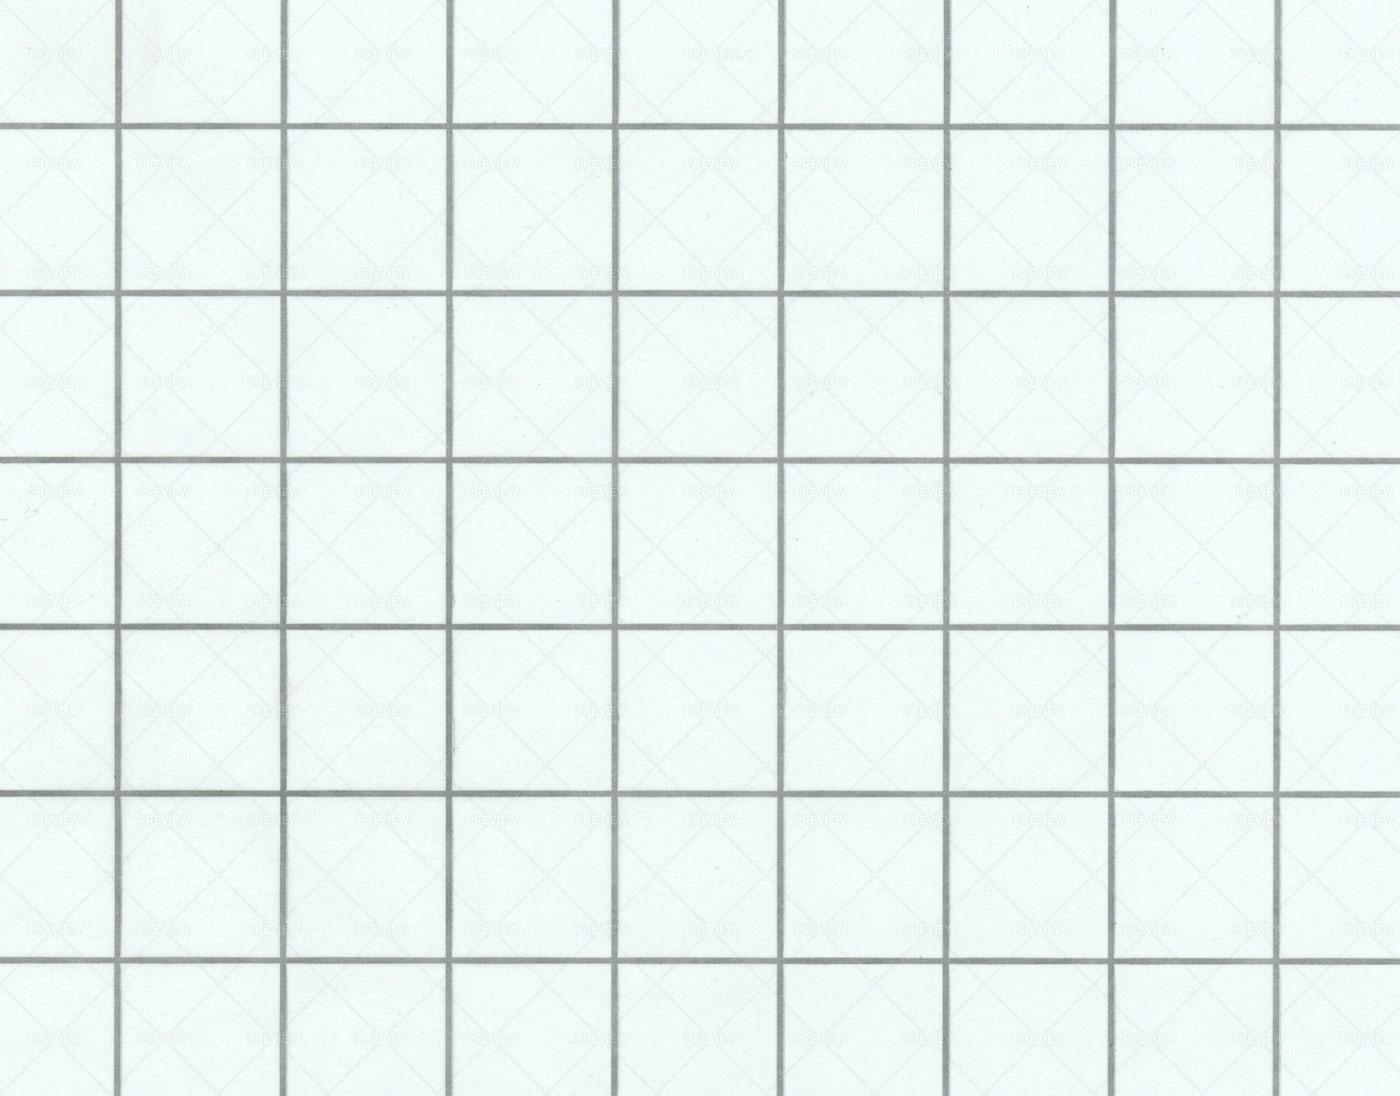 Graph Paper Texture: Stock Photos